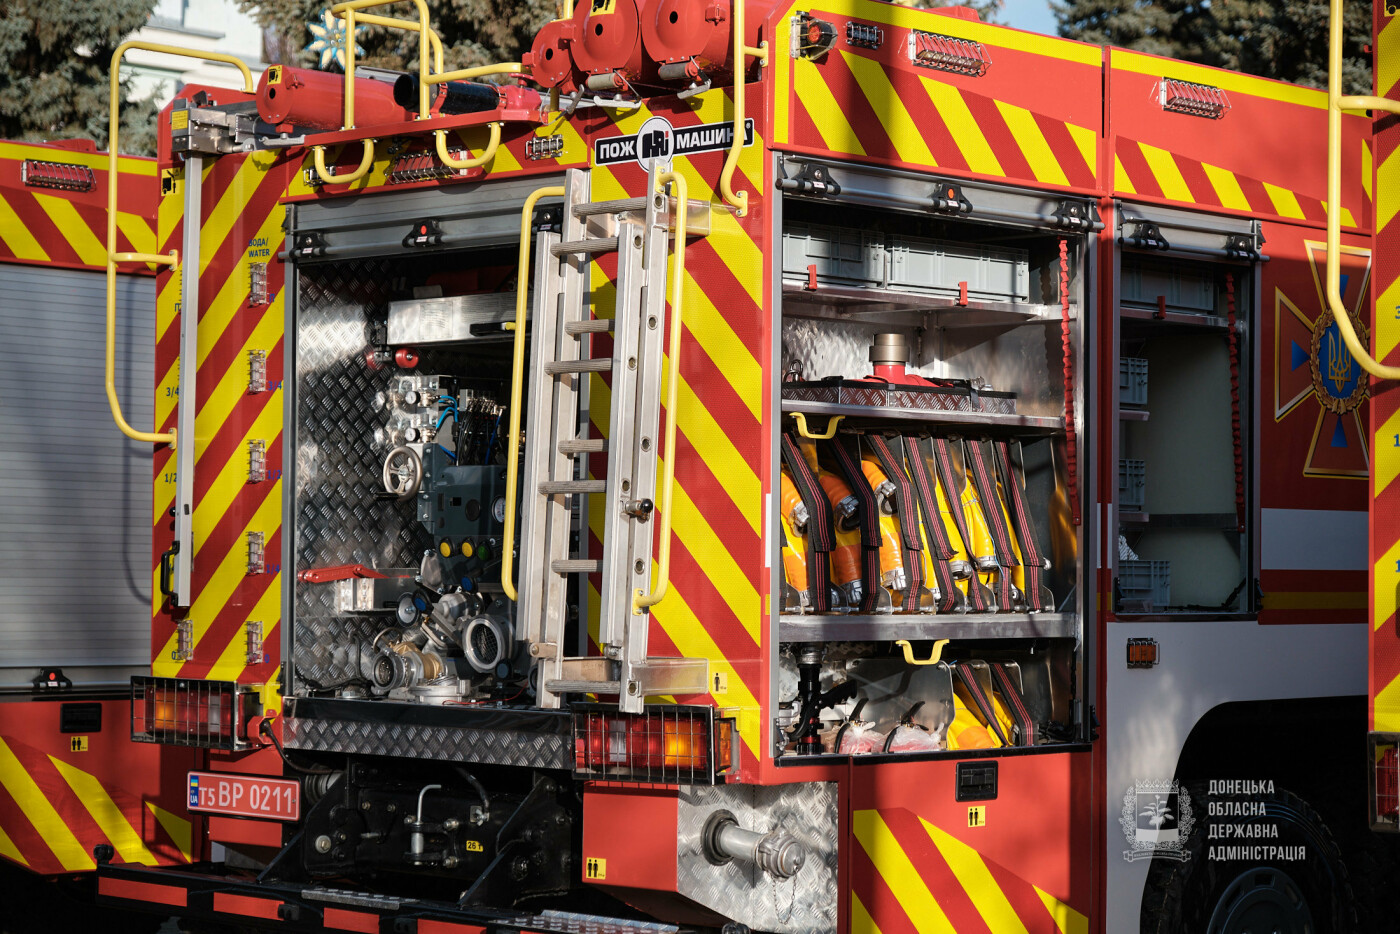 Слов'янські рятувальники отримали нову пожежну автоцистерну, фото-4